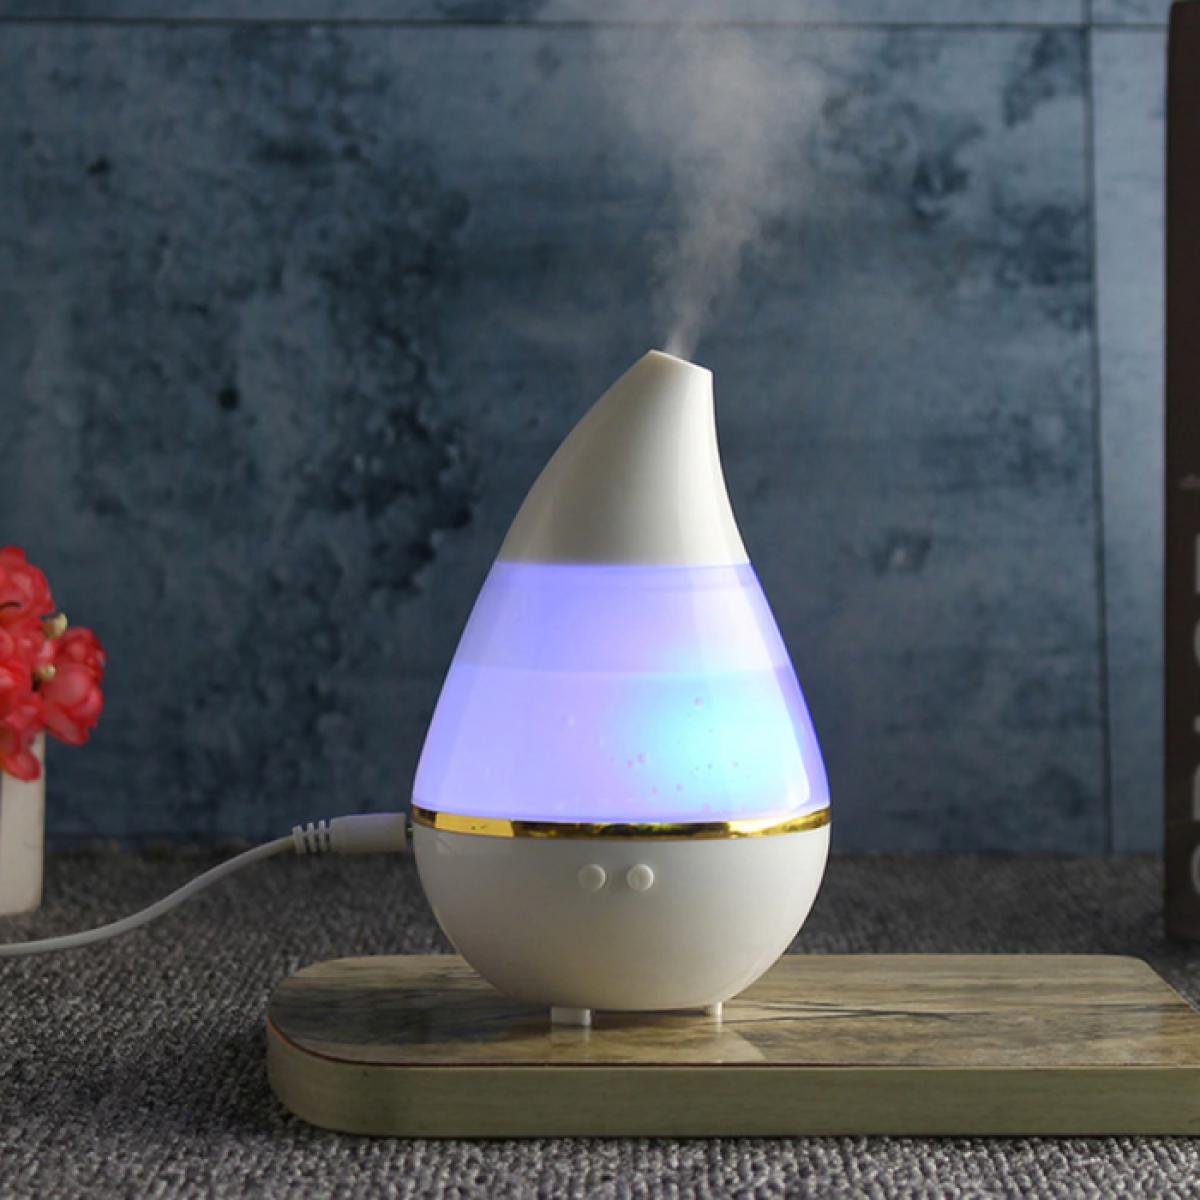 Water Drop Ultrasonic Humidifier Diffuser 7 Color LED - Bunda Ina Shop